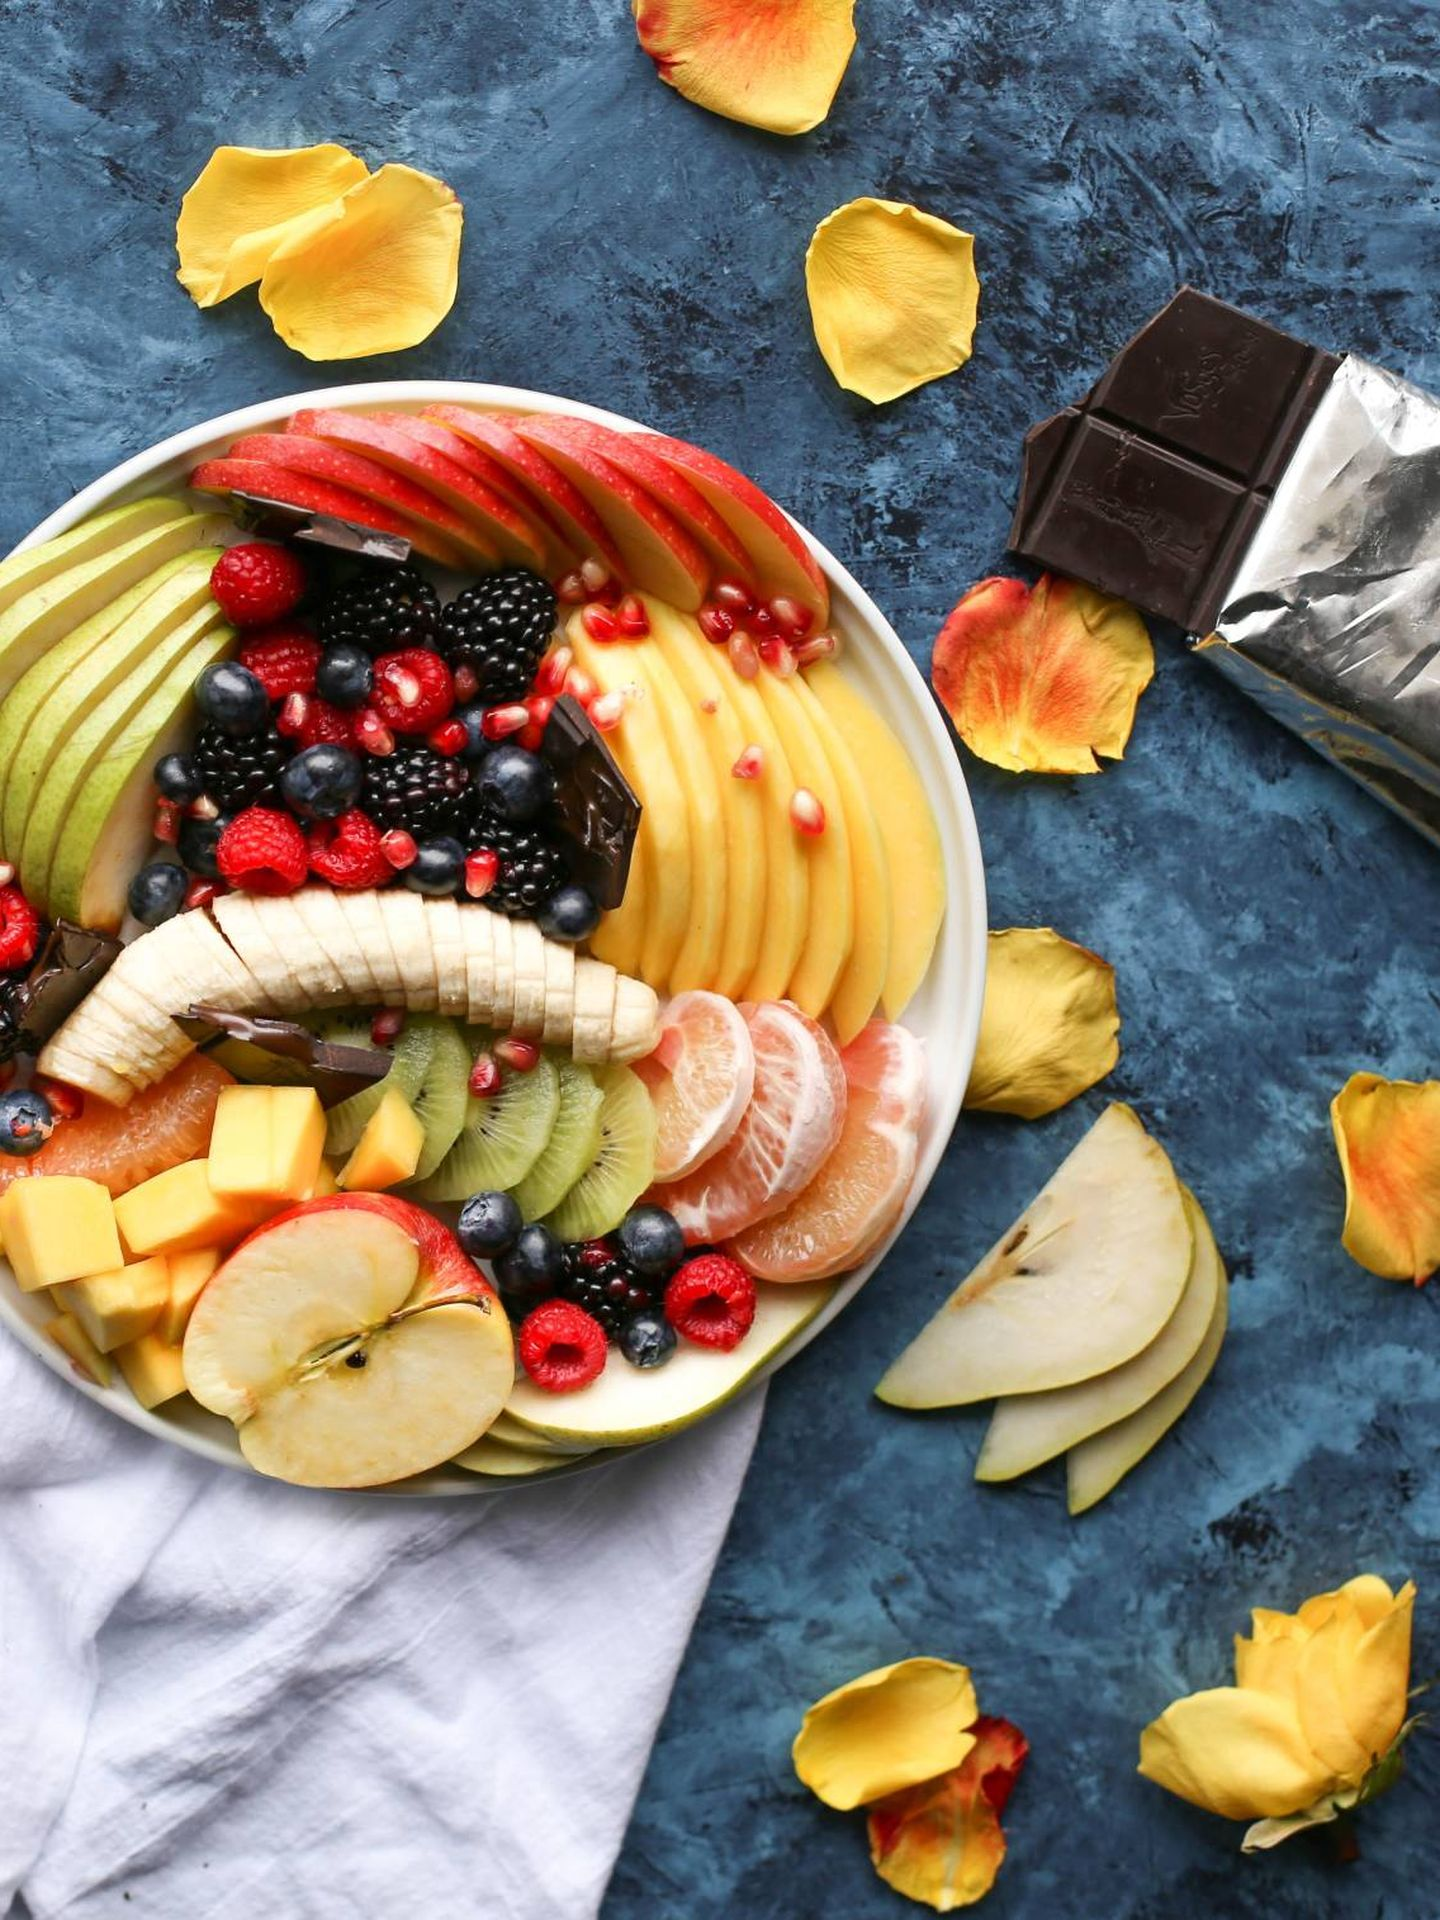 Trucos para reducir el azúcar en tu dieta. (Brenda Godinez para Unsplash)